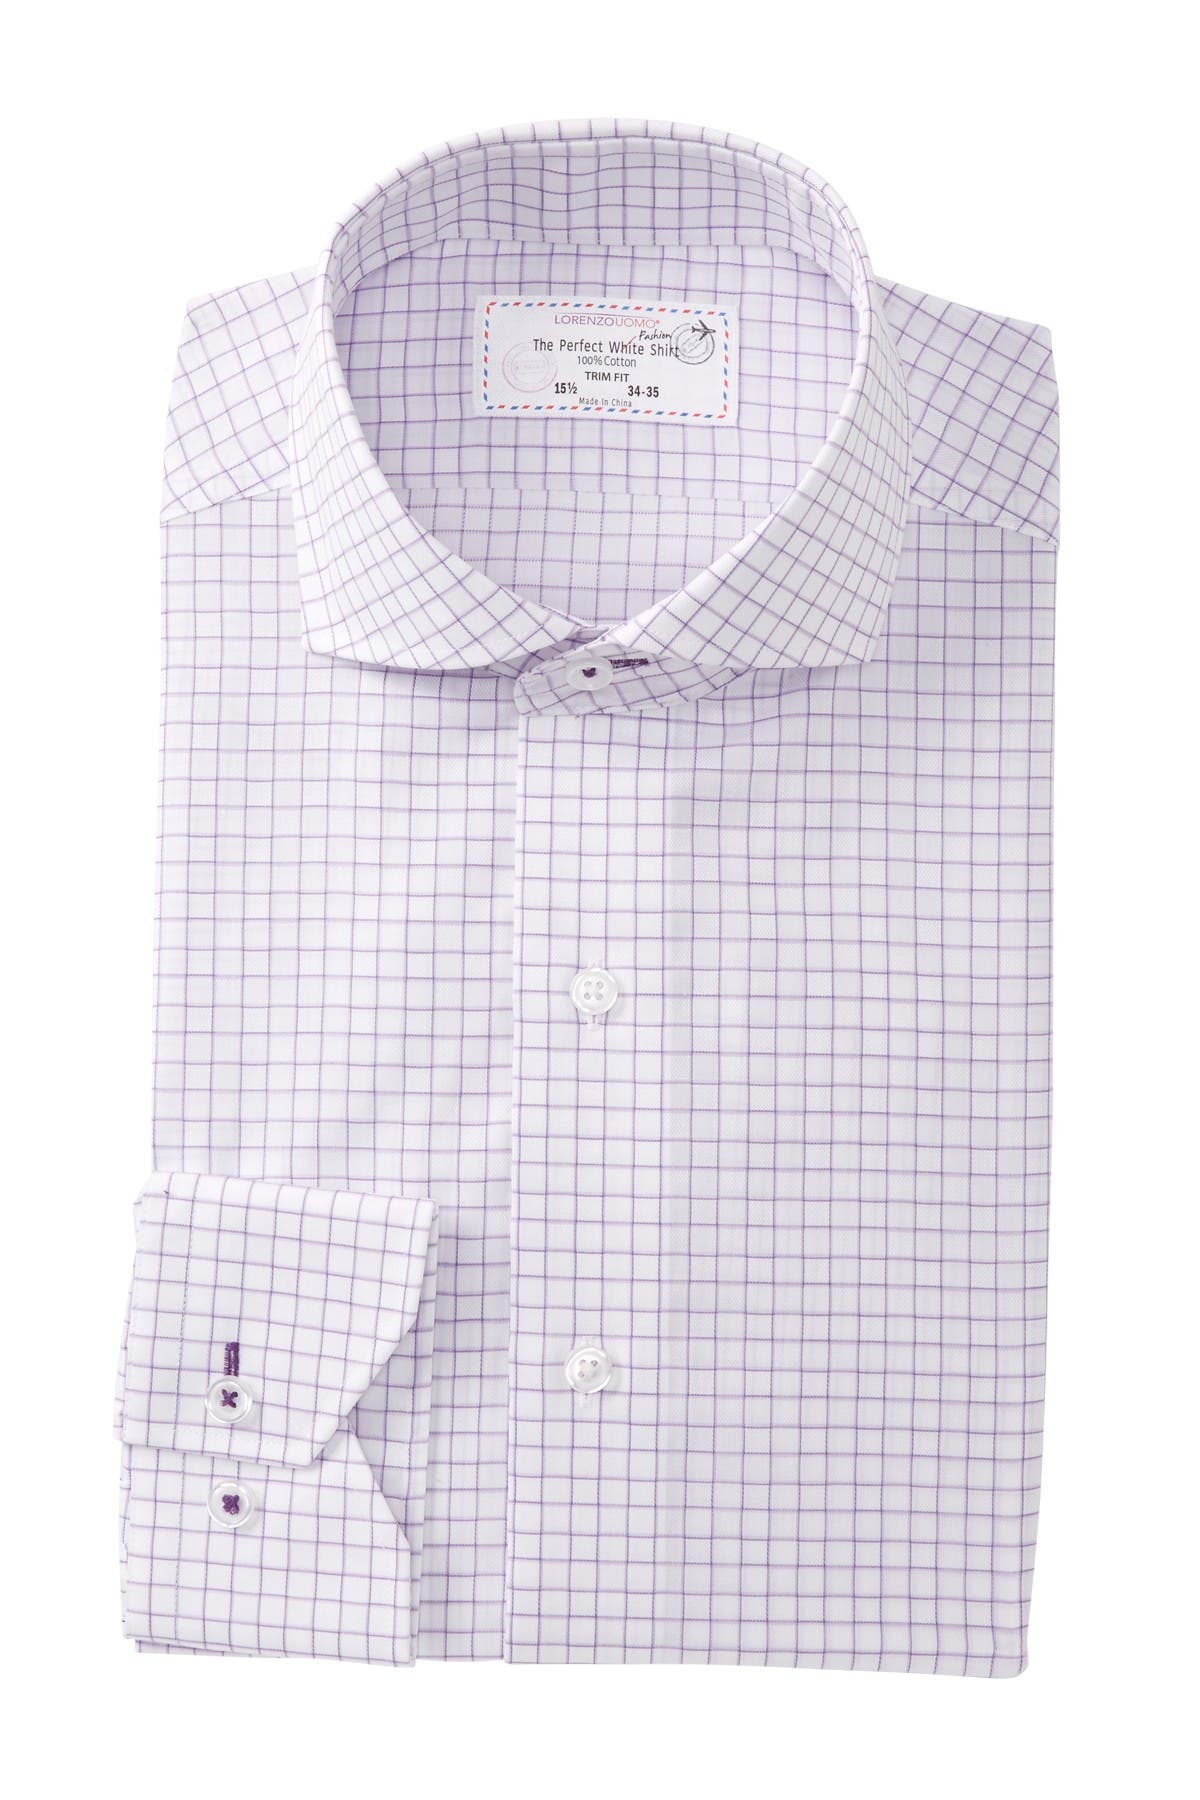 Image of Lorenzo Uomo Windowpane Trim Fit Dress Shirt